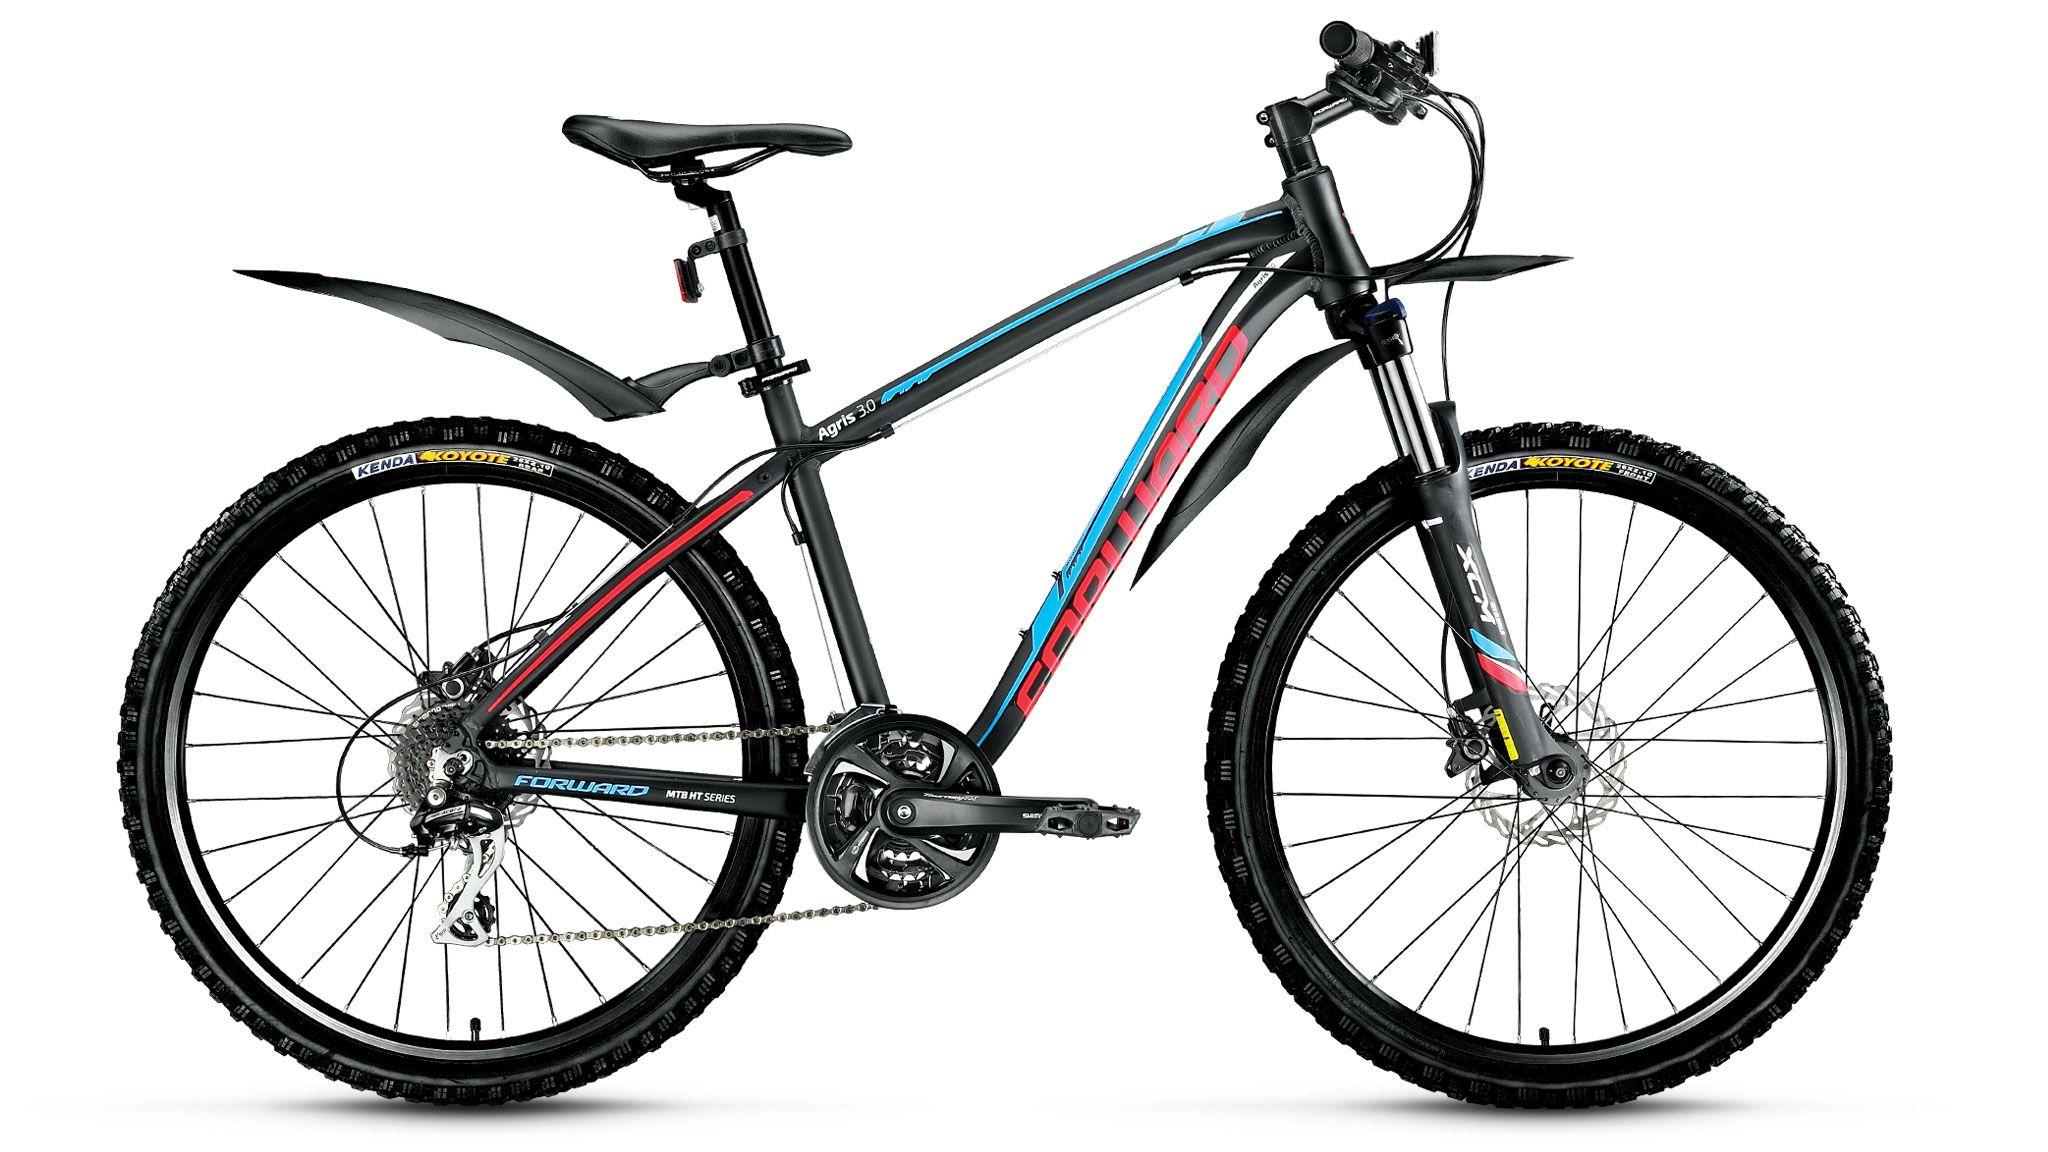 FORWARD Велосипед Forward Agris 3.0 disc (2016) красный-матовый 19 велосипед forward portsmouth 1 0 19 2016 black